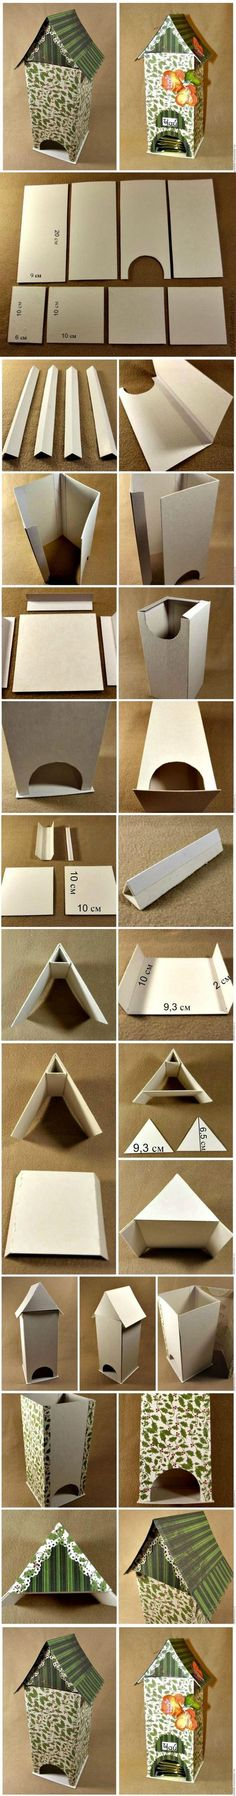 DIY Cardboard Tea Bag Dispenser DIY Projects / UsefulDIY.com